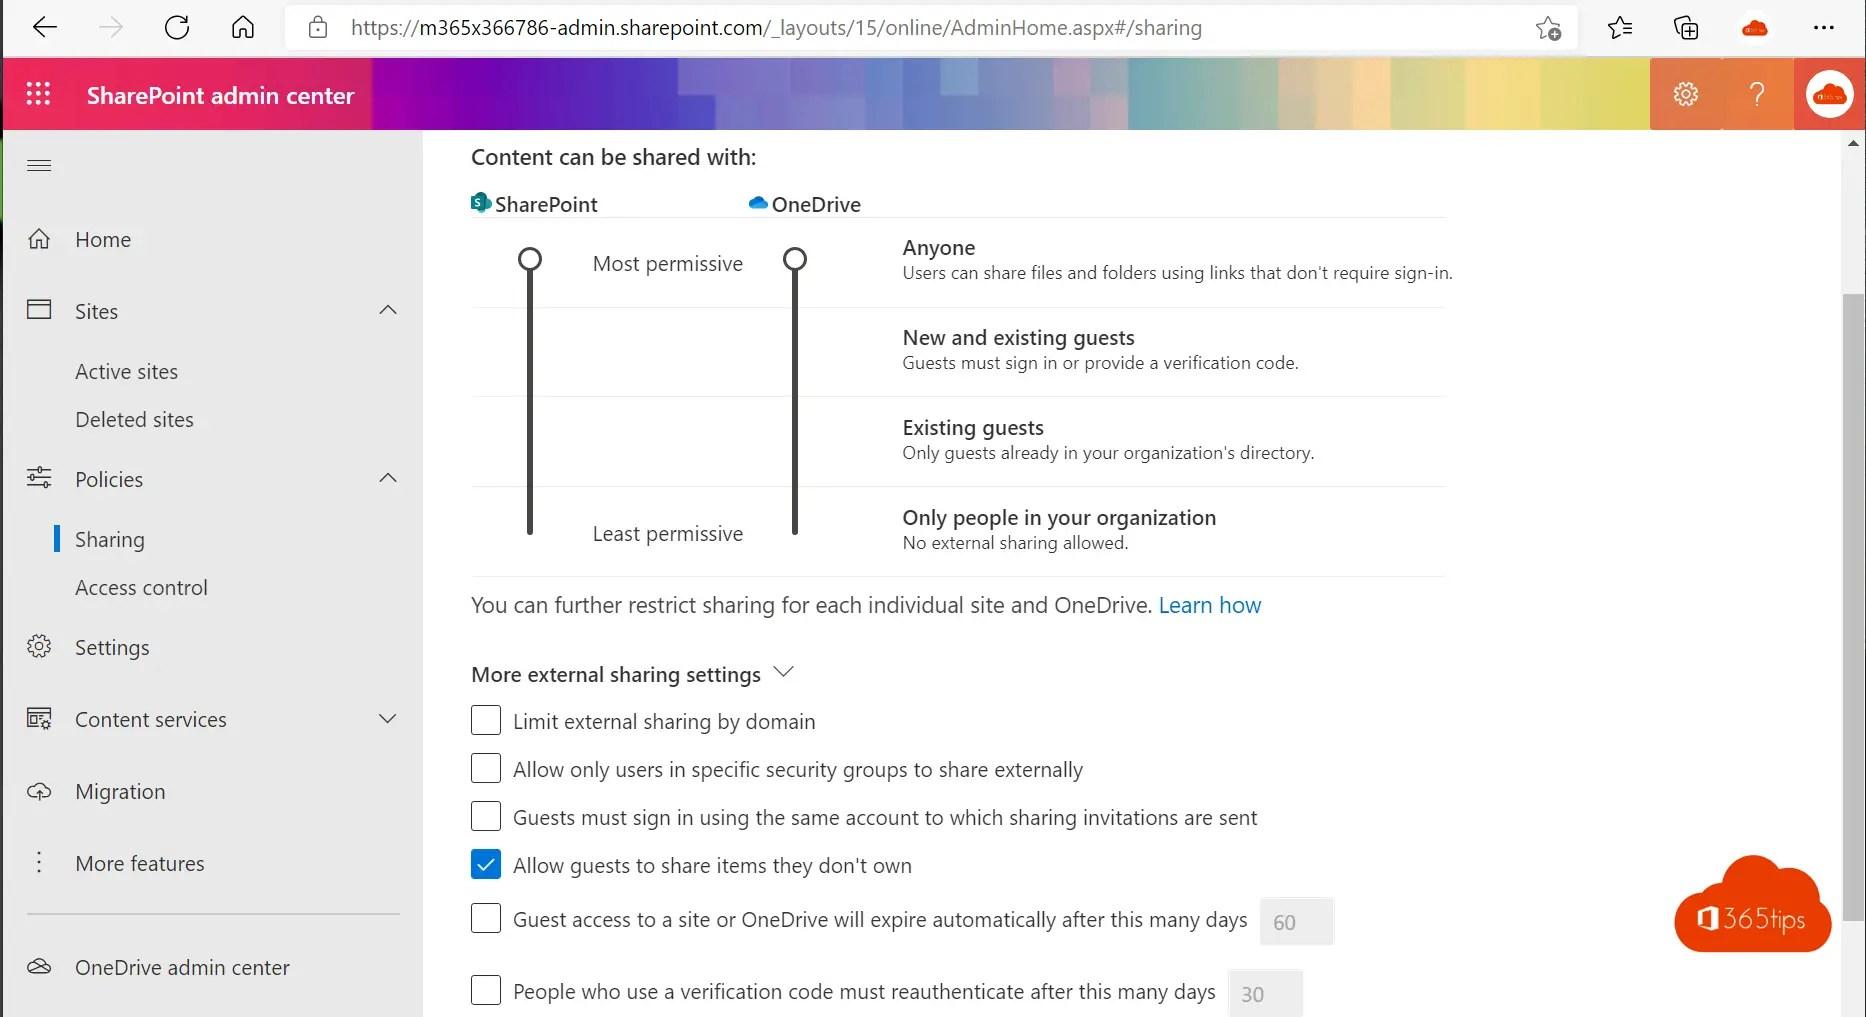 Tenant naam of SharePoint URL updaten?